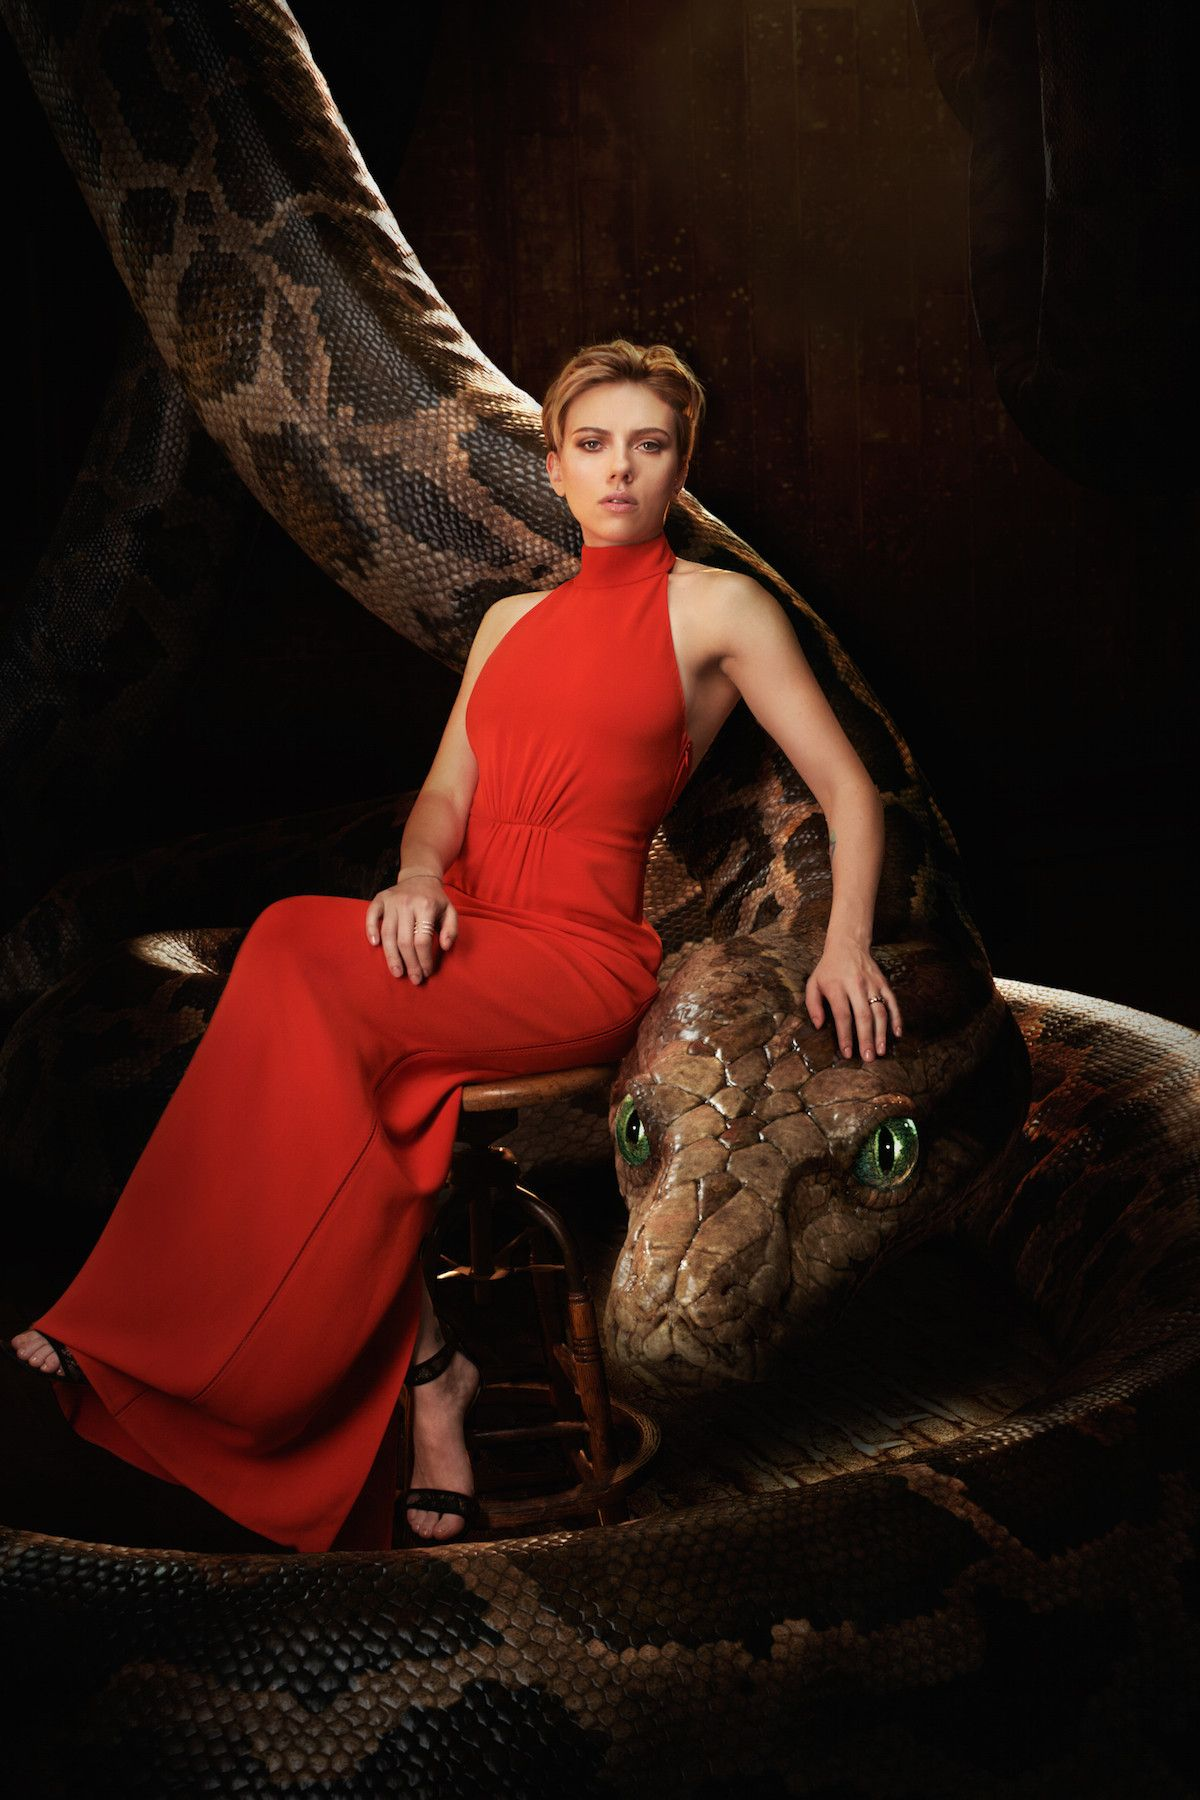 Missing Link The jungle book cast, Scarlett johansson